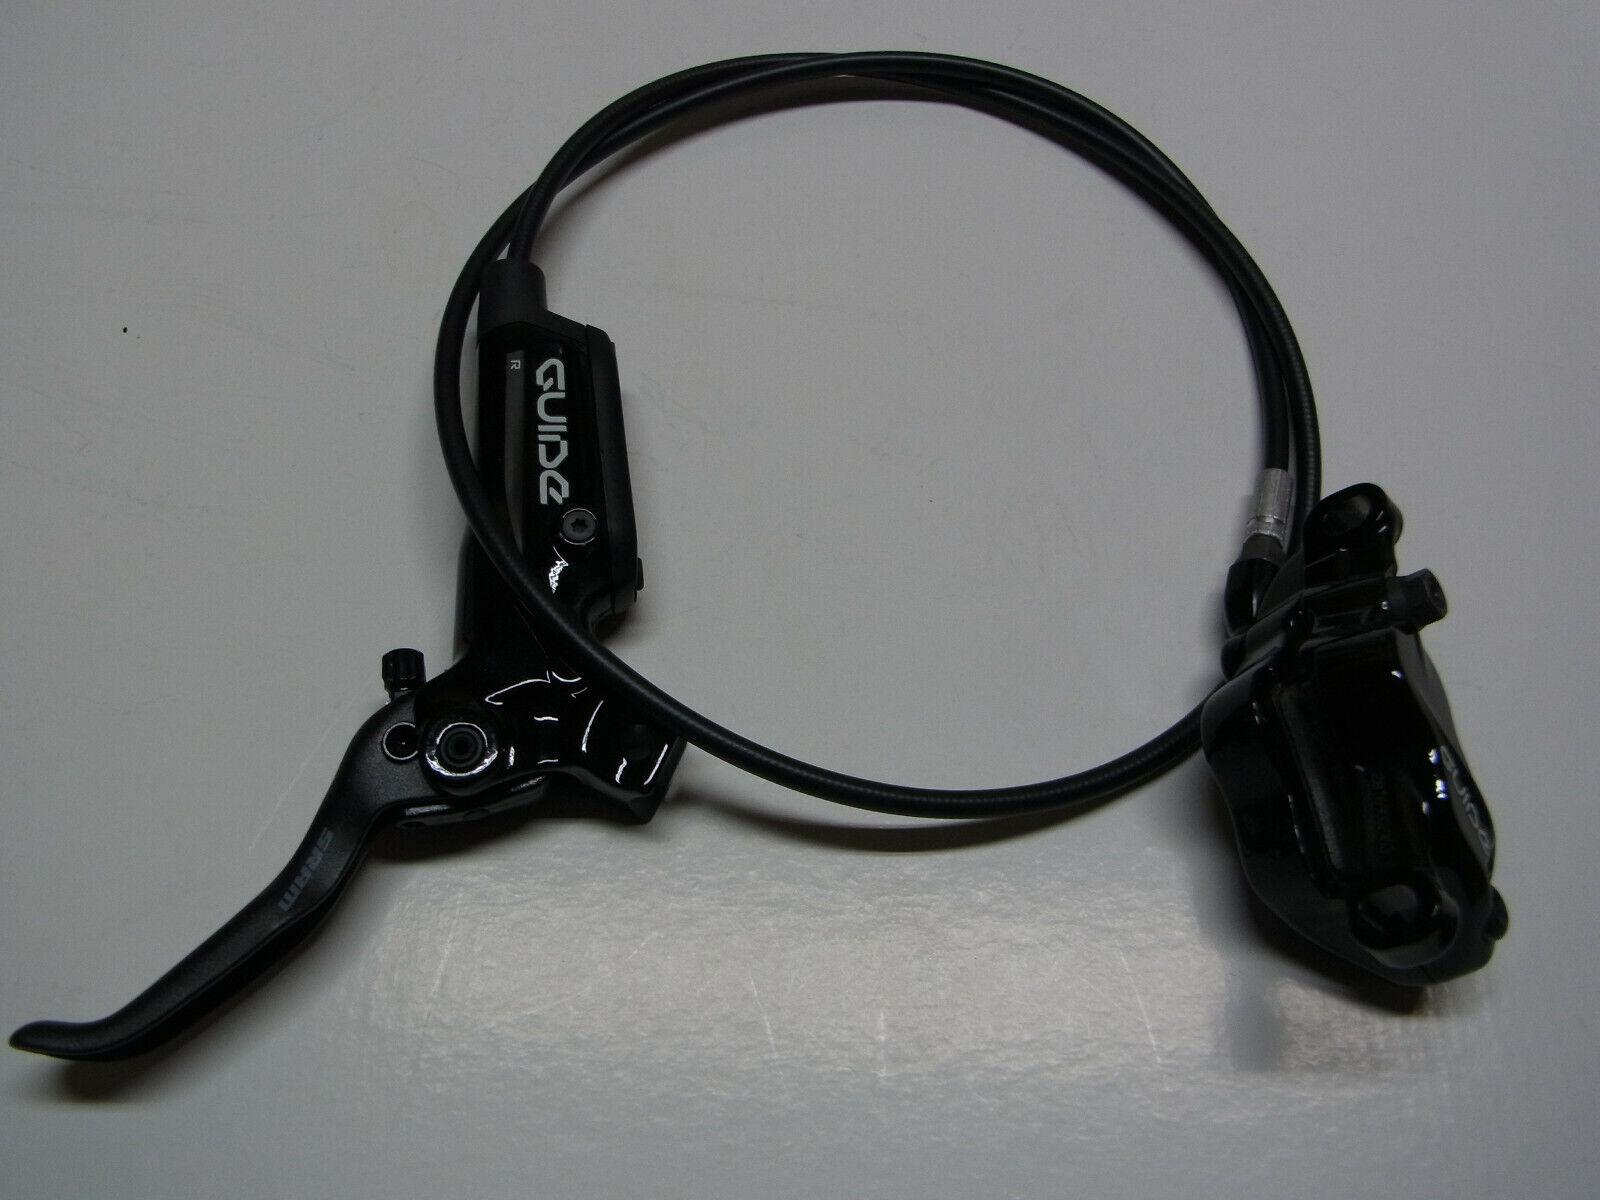 SRAM Guide R freno delantero MTB negro (005)